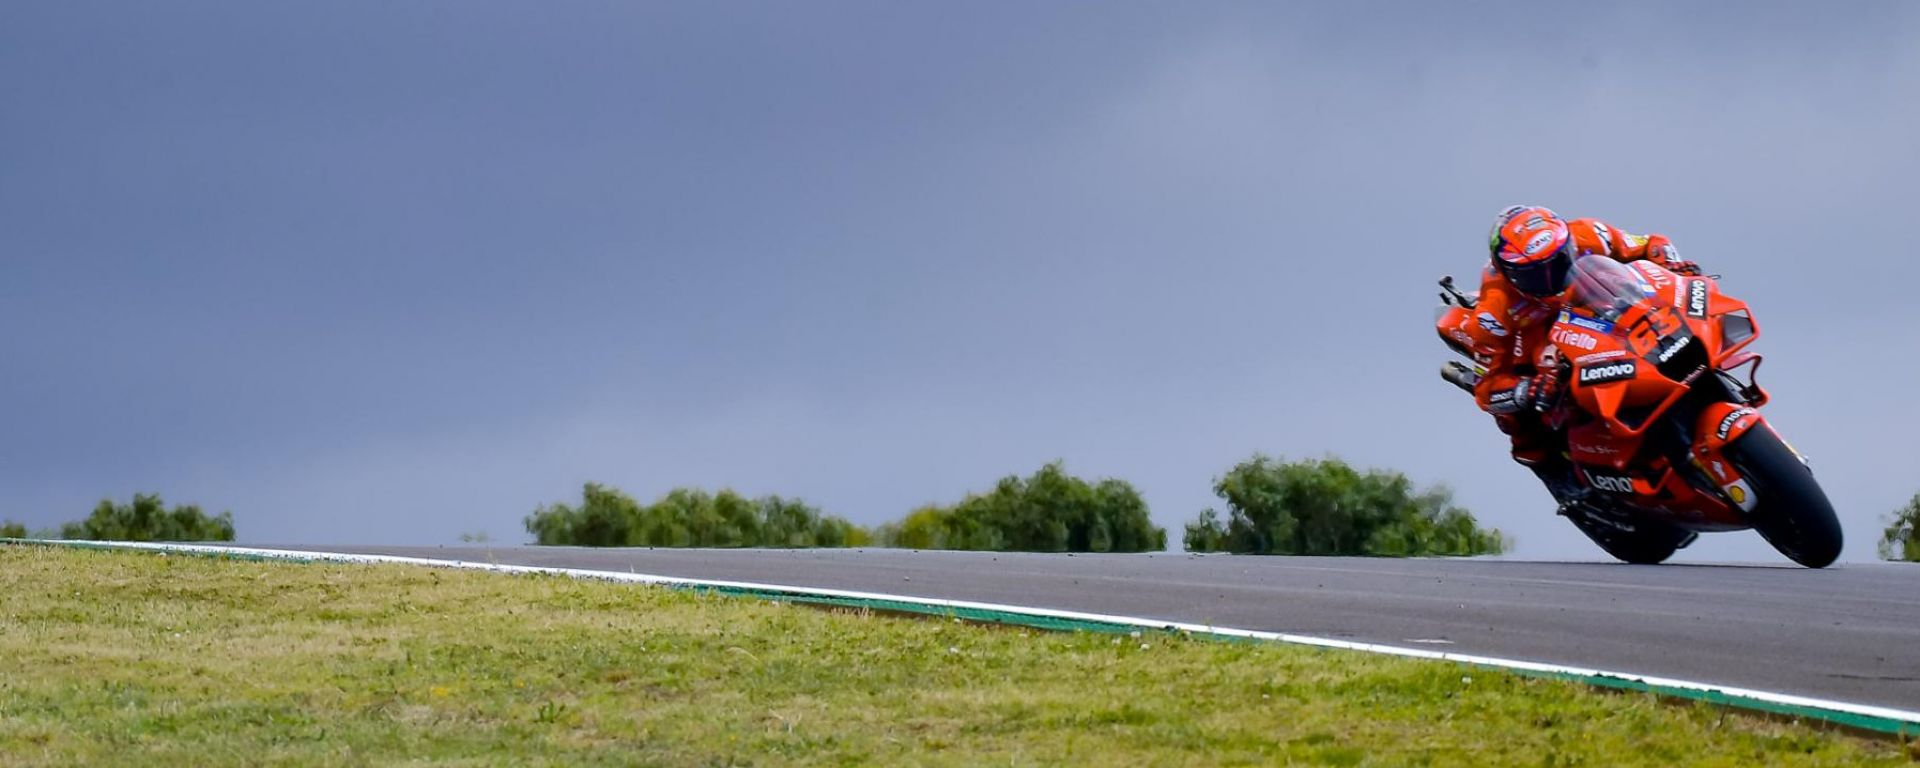 MotoGP Portogallo 2021, Portimao: Francesco Bagnaia (Ducati)